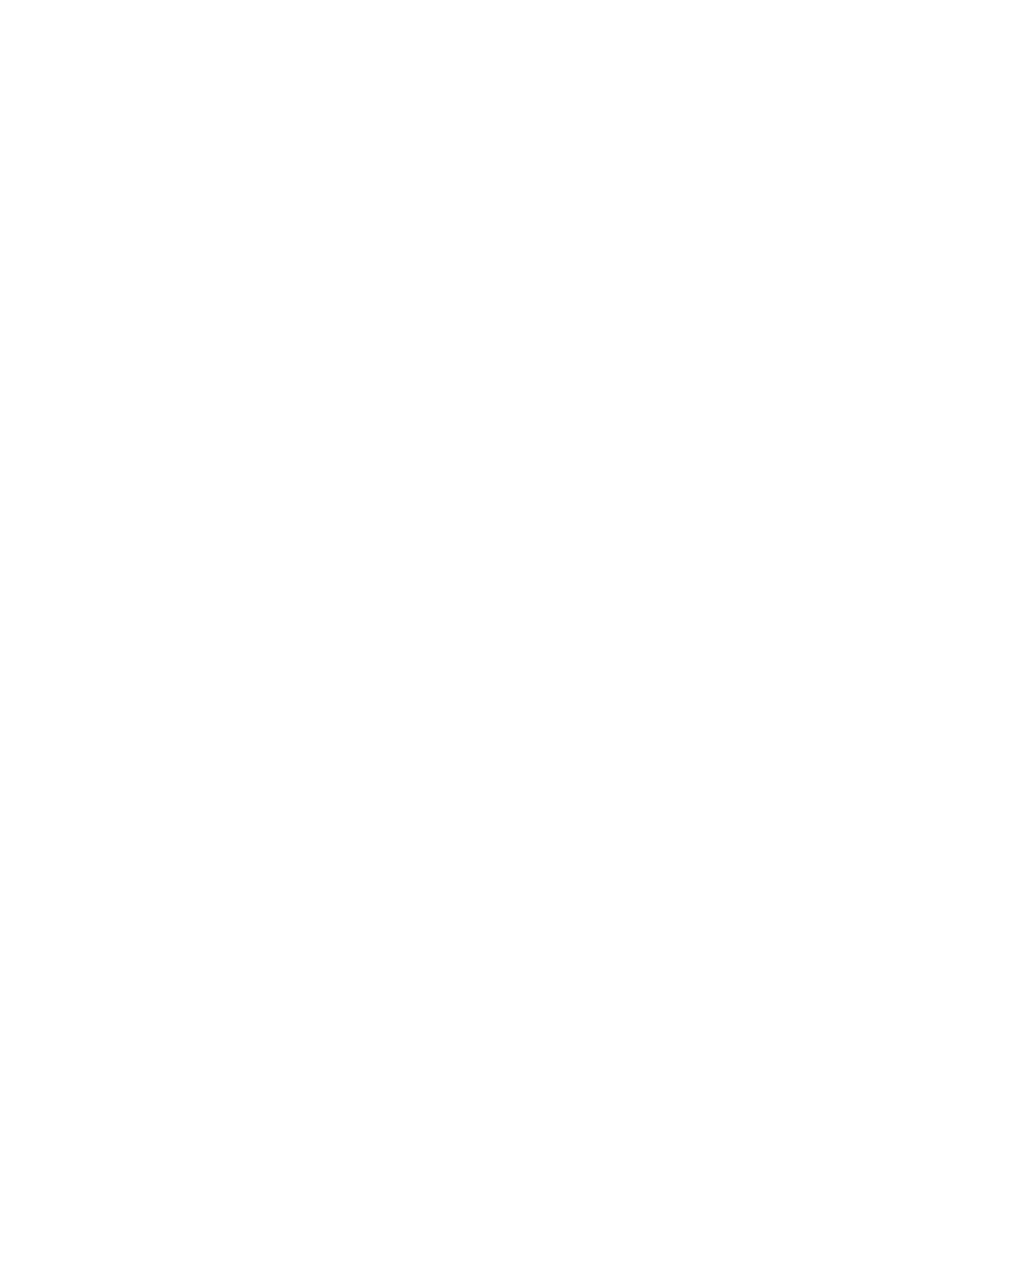 Lululemon Live Simply Jacket - Heathered Blurred Grey